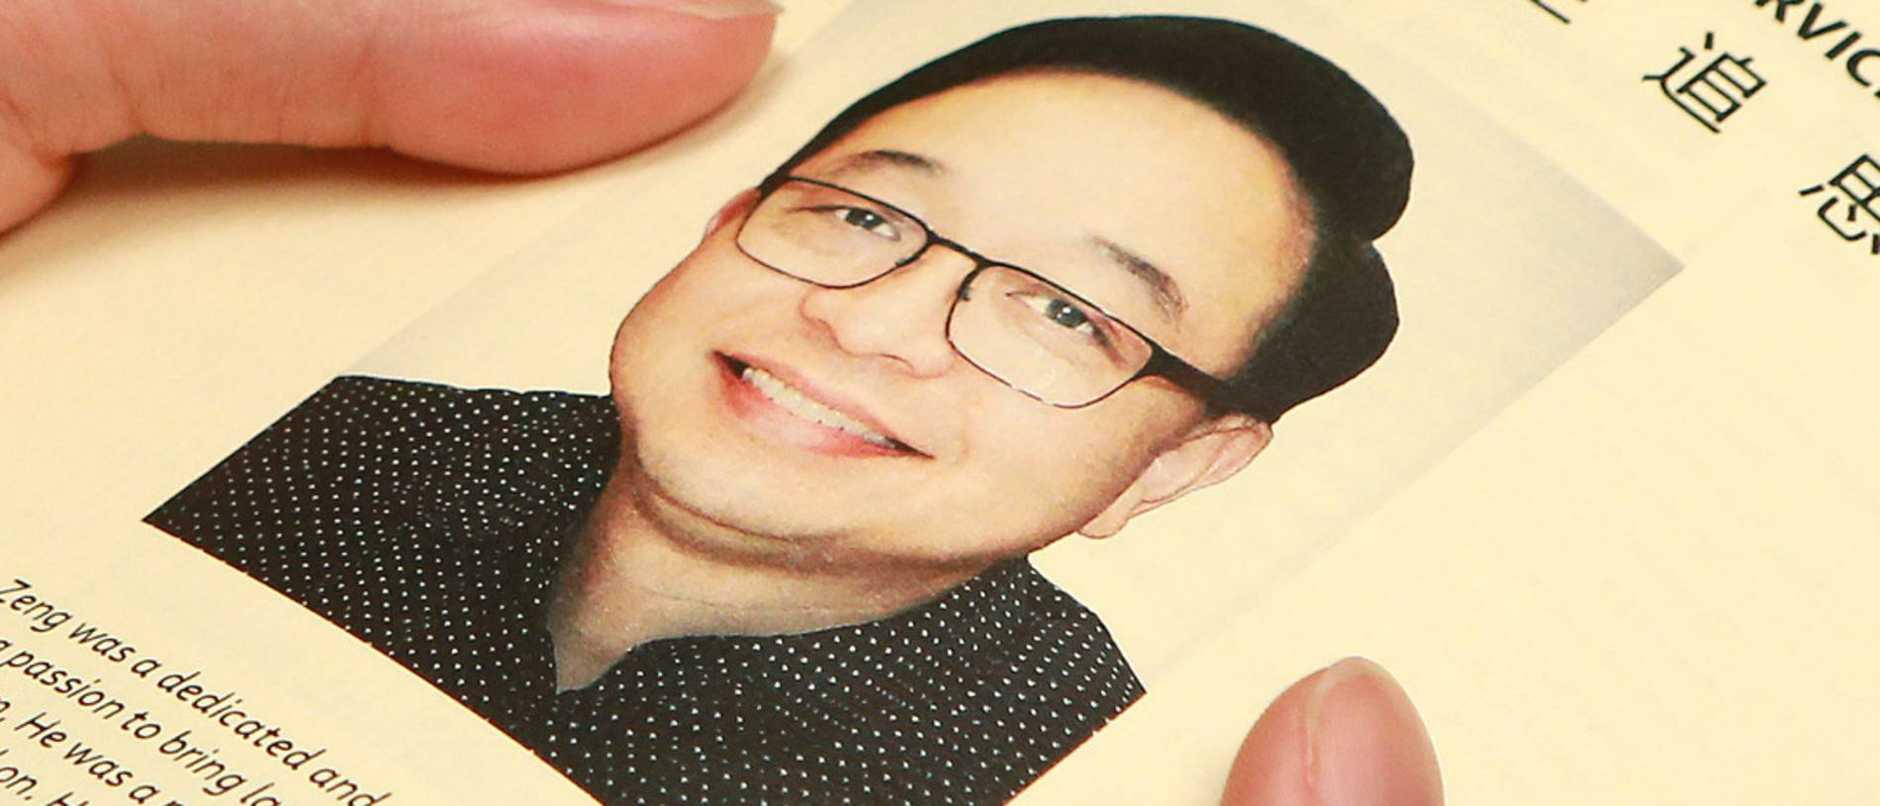 Dr Luping Zeng